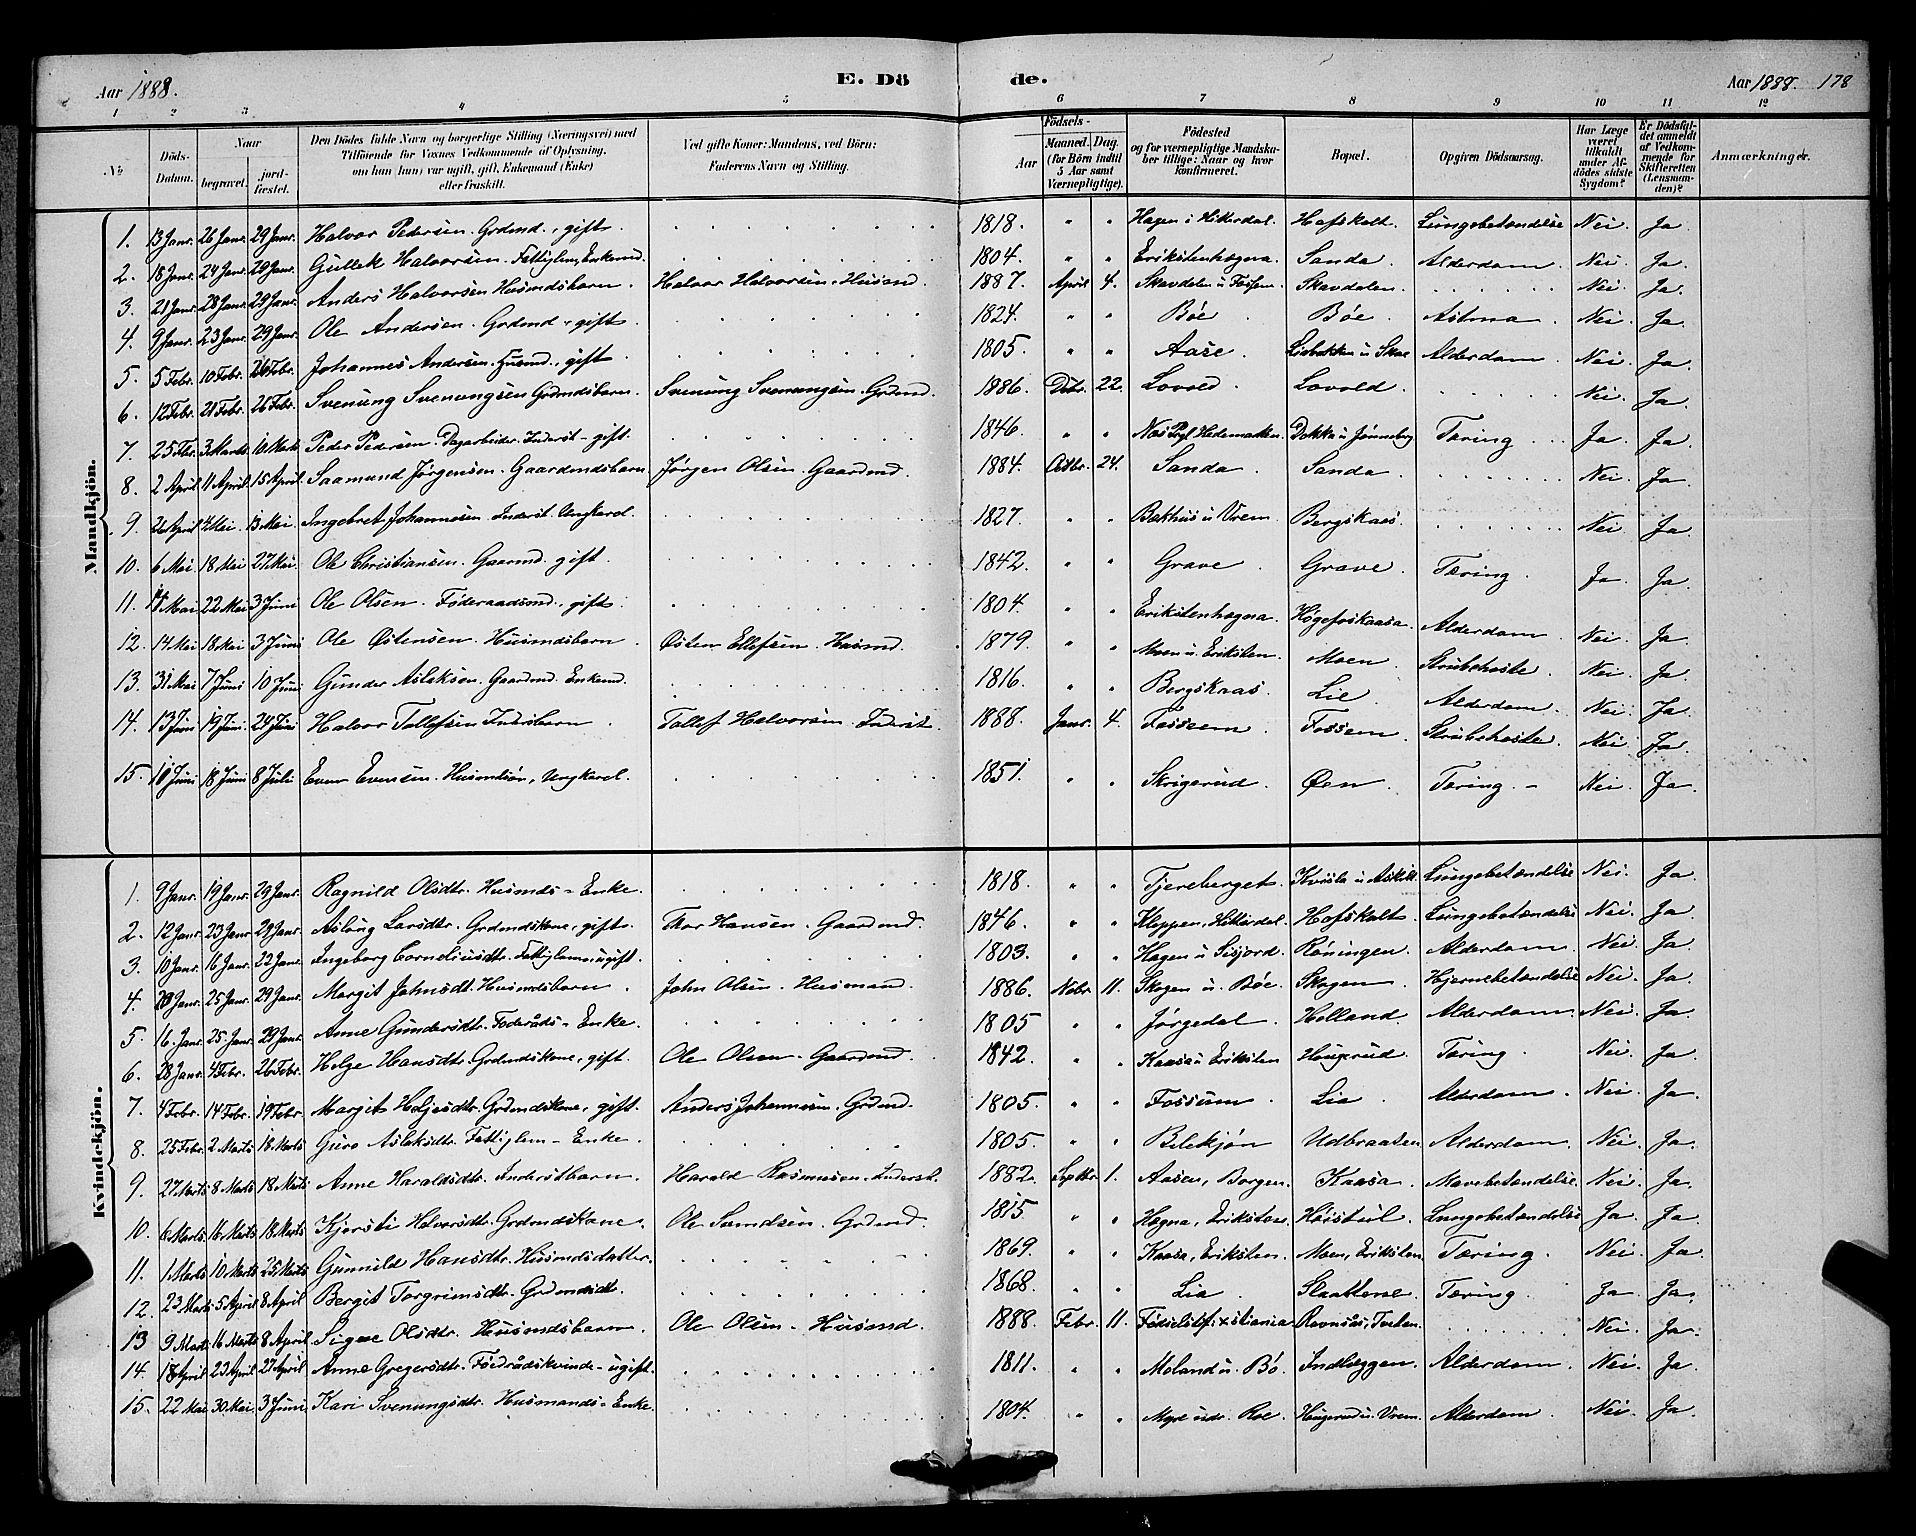 SAKO, Bø kirkebøker, G/Ga/L0005: Klokkerbok nr. 5, 1883-1897, s. 178